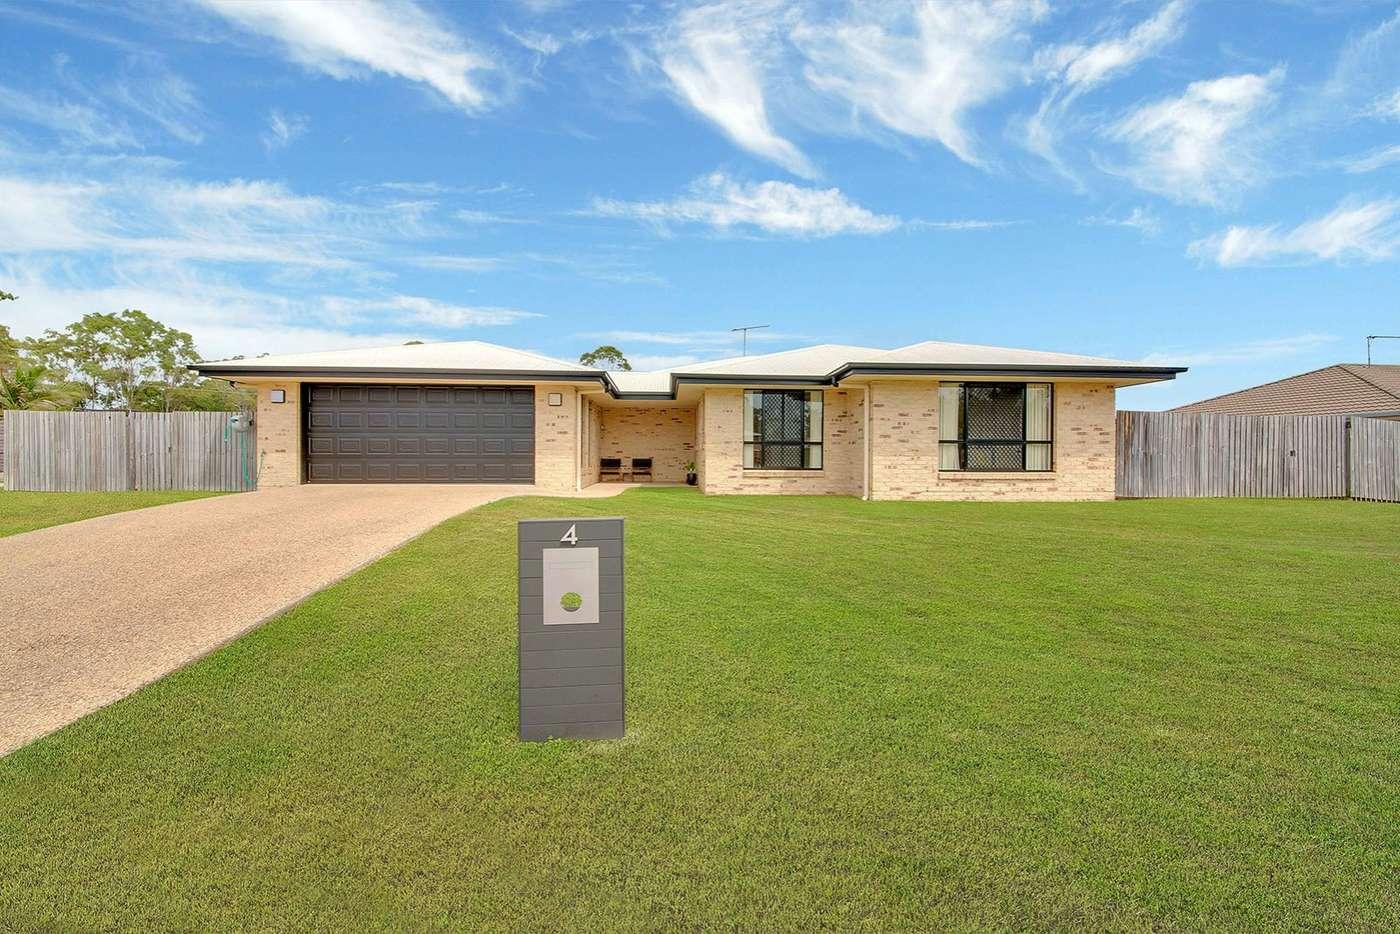 Main view of Homely house listing, 4 Jooloo Court, Kin Kora QLD 4680